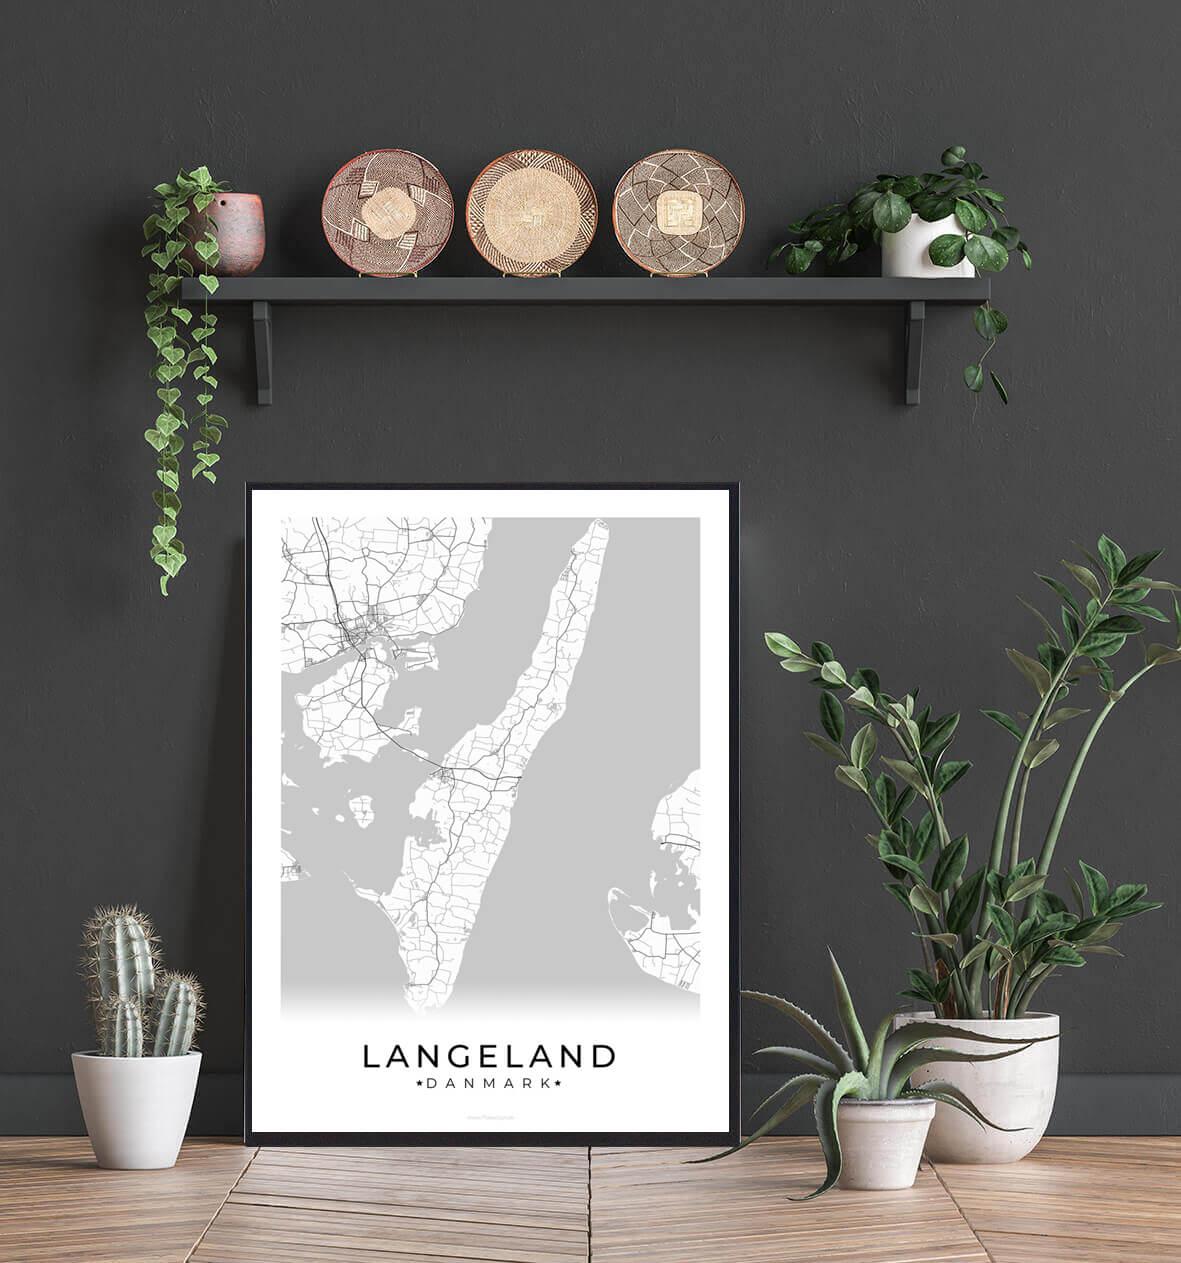 Langeland-plakat-omraade-Hvid-2